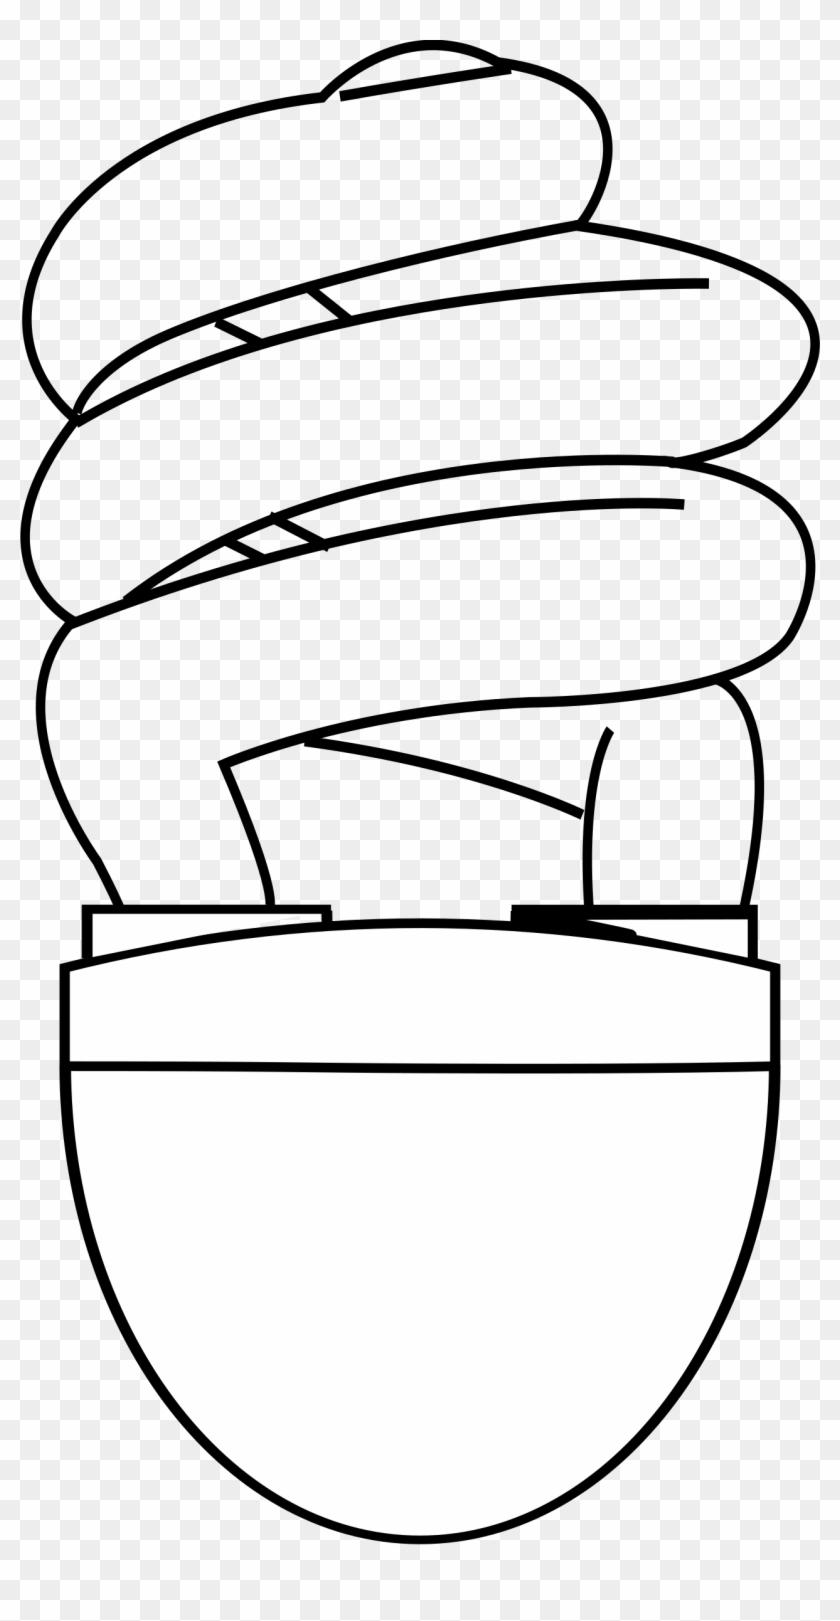 Cfl Light Bulb Clip Art - Cfl Clip Art #150130